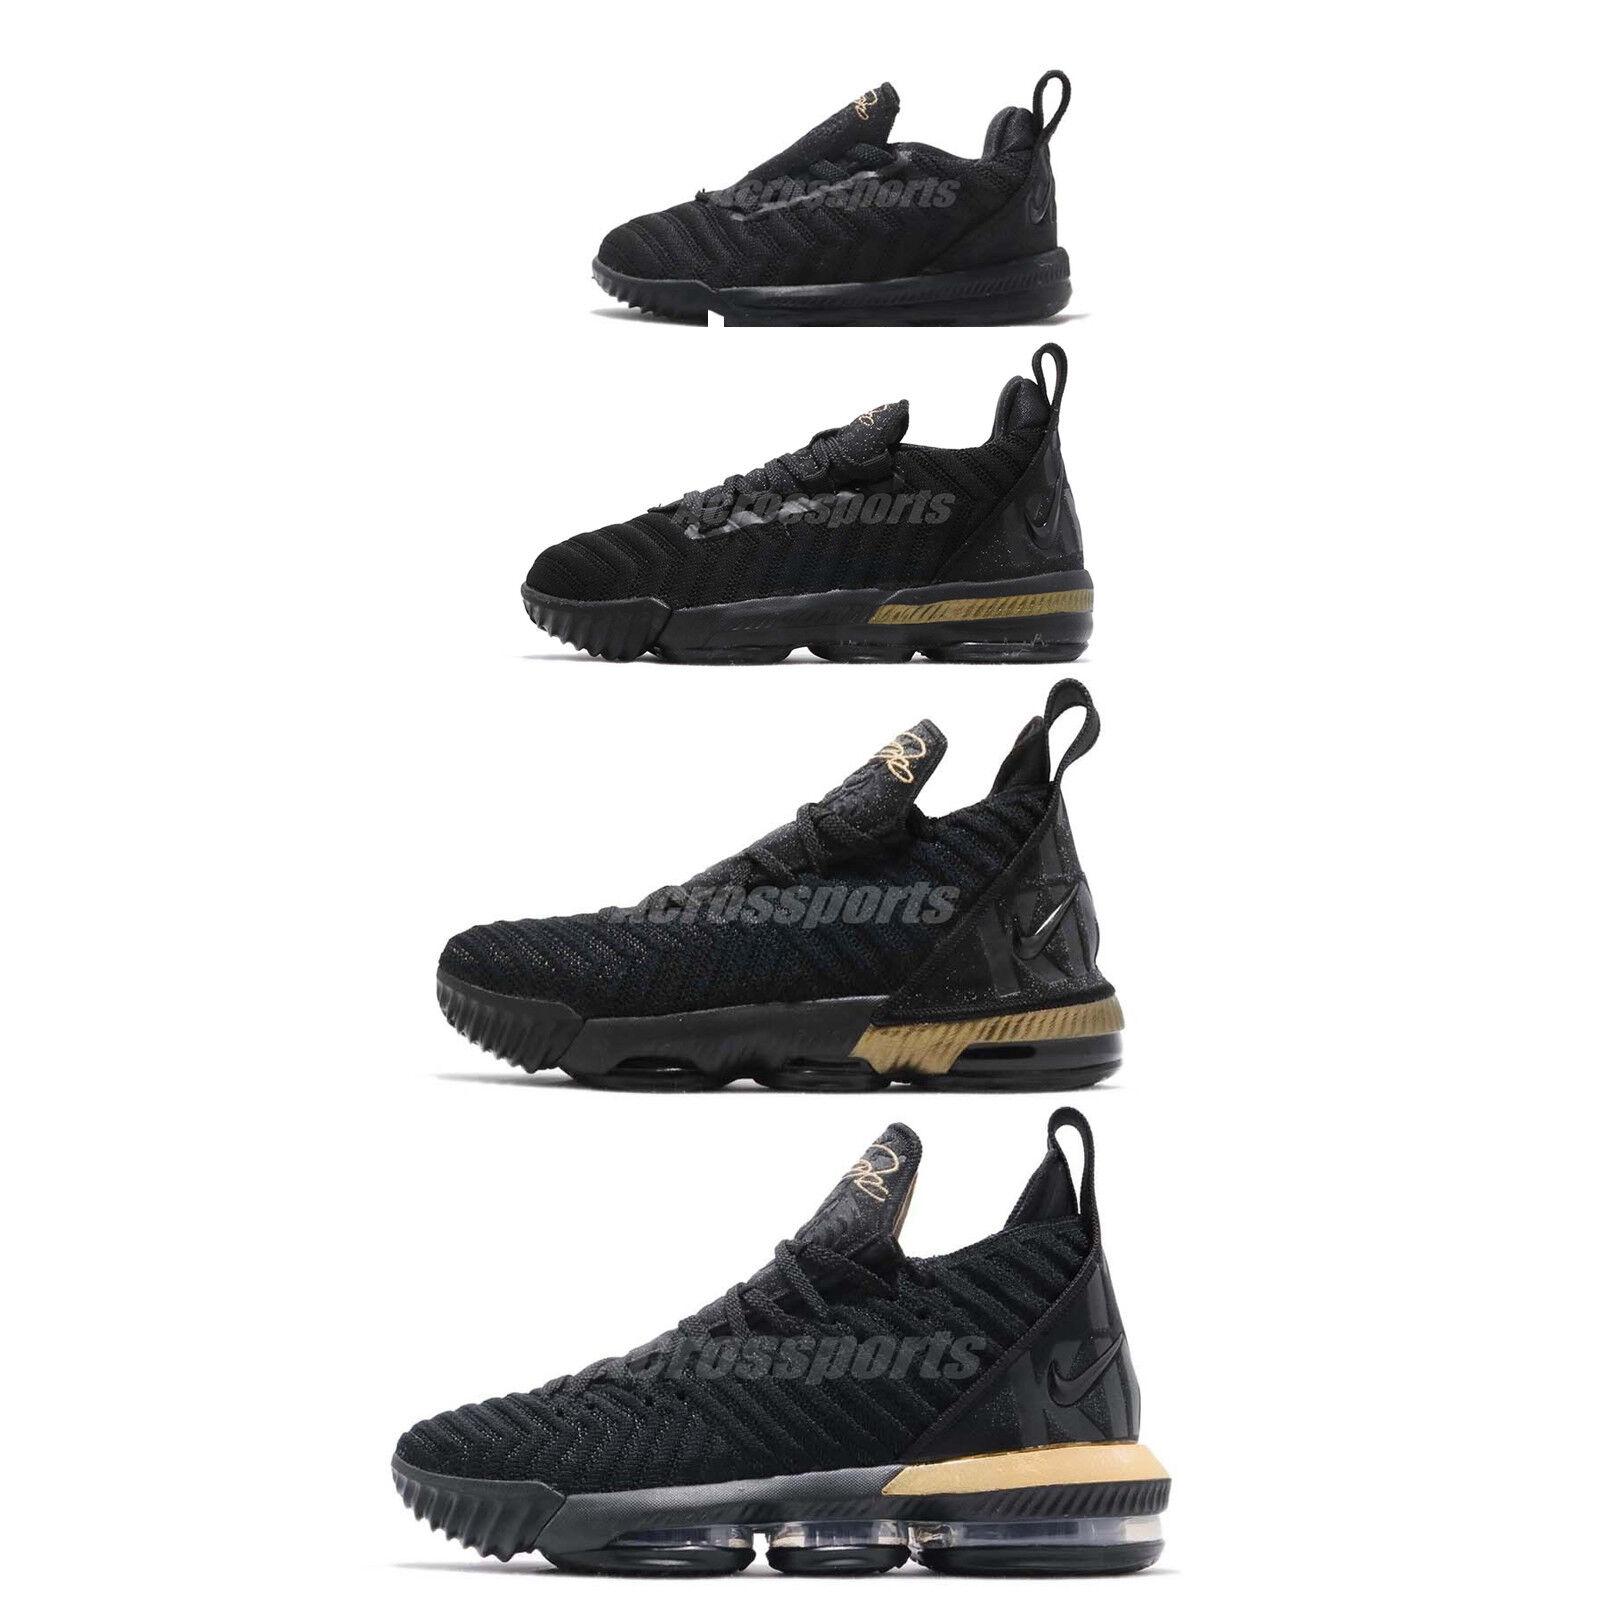 Nike LeBron XVI 16 James Im King nero oro Basketball scarpe Family Dimensione Pick 1